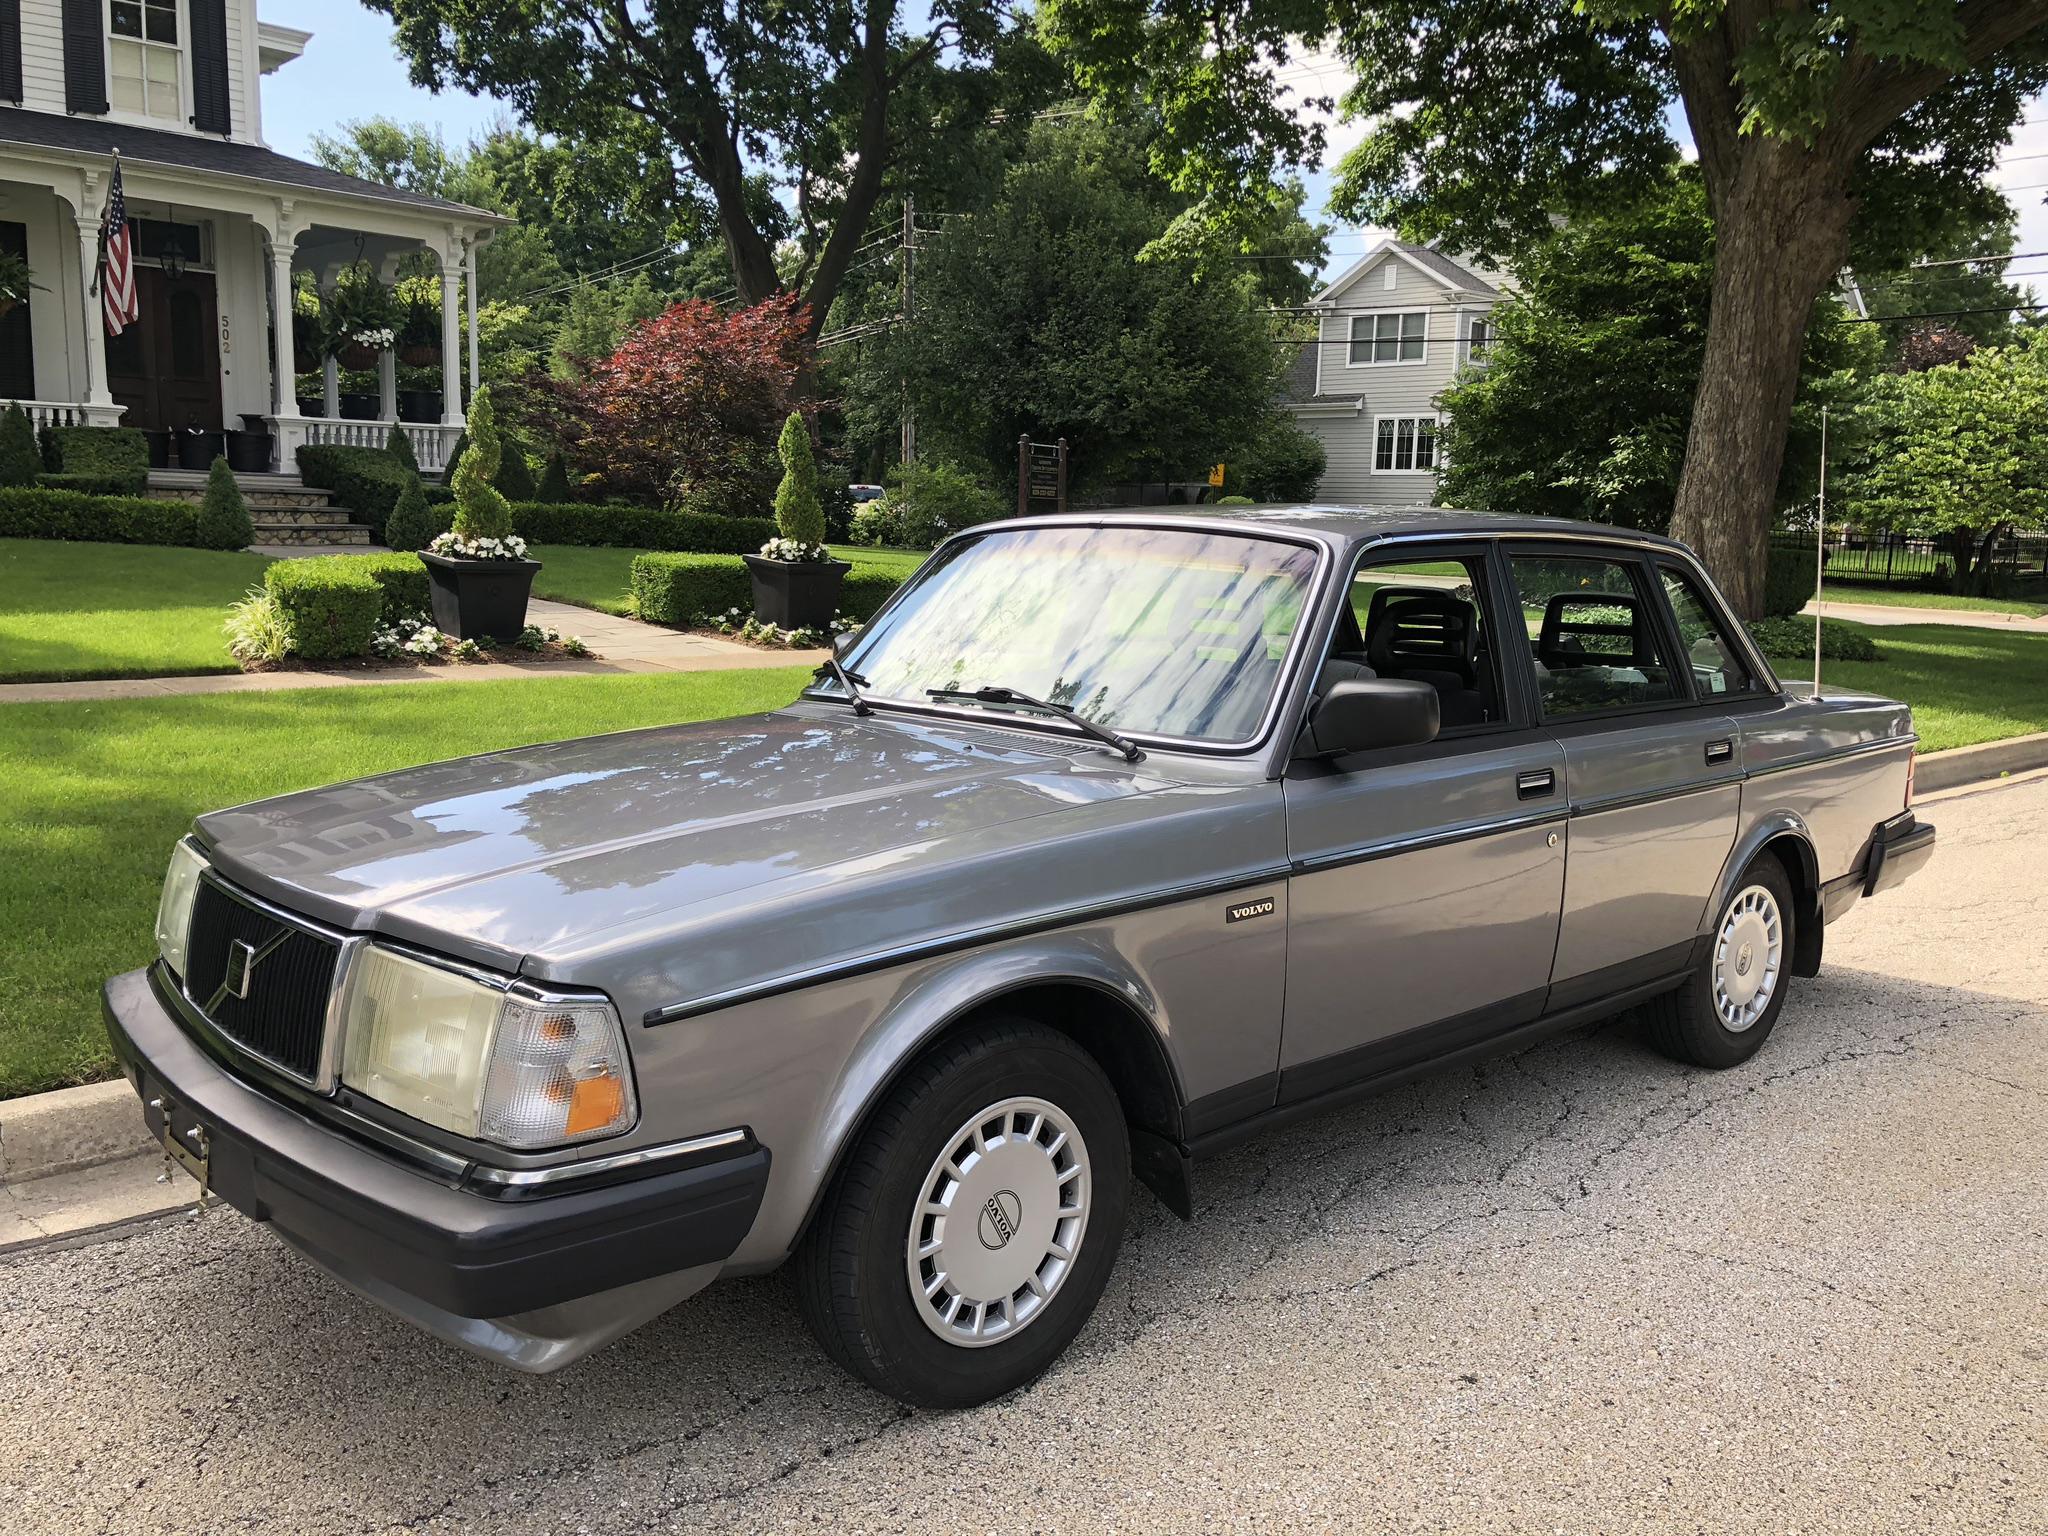 McLoughlin - '89 Volvo 240 - SOLD - Jacksonville, FL